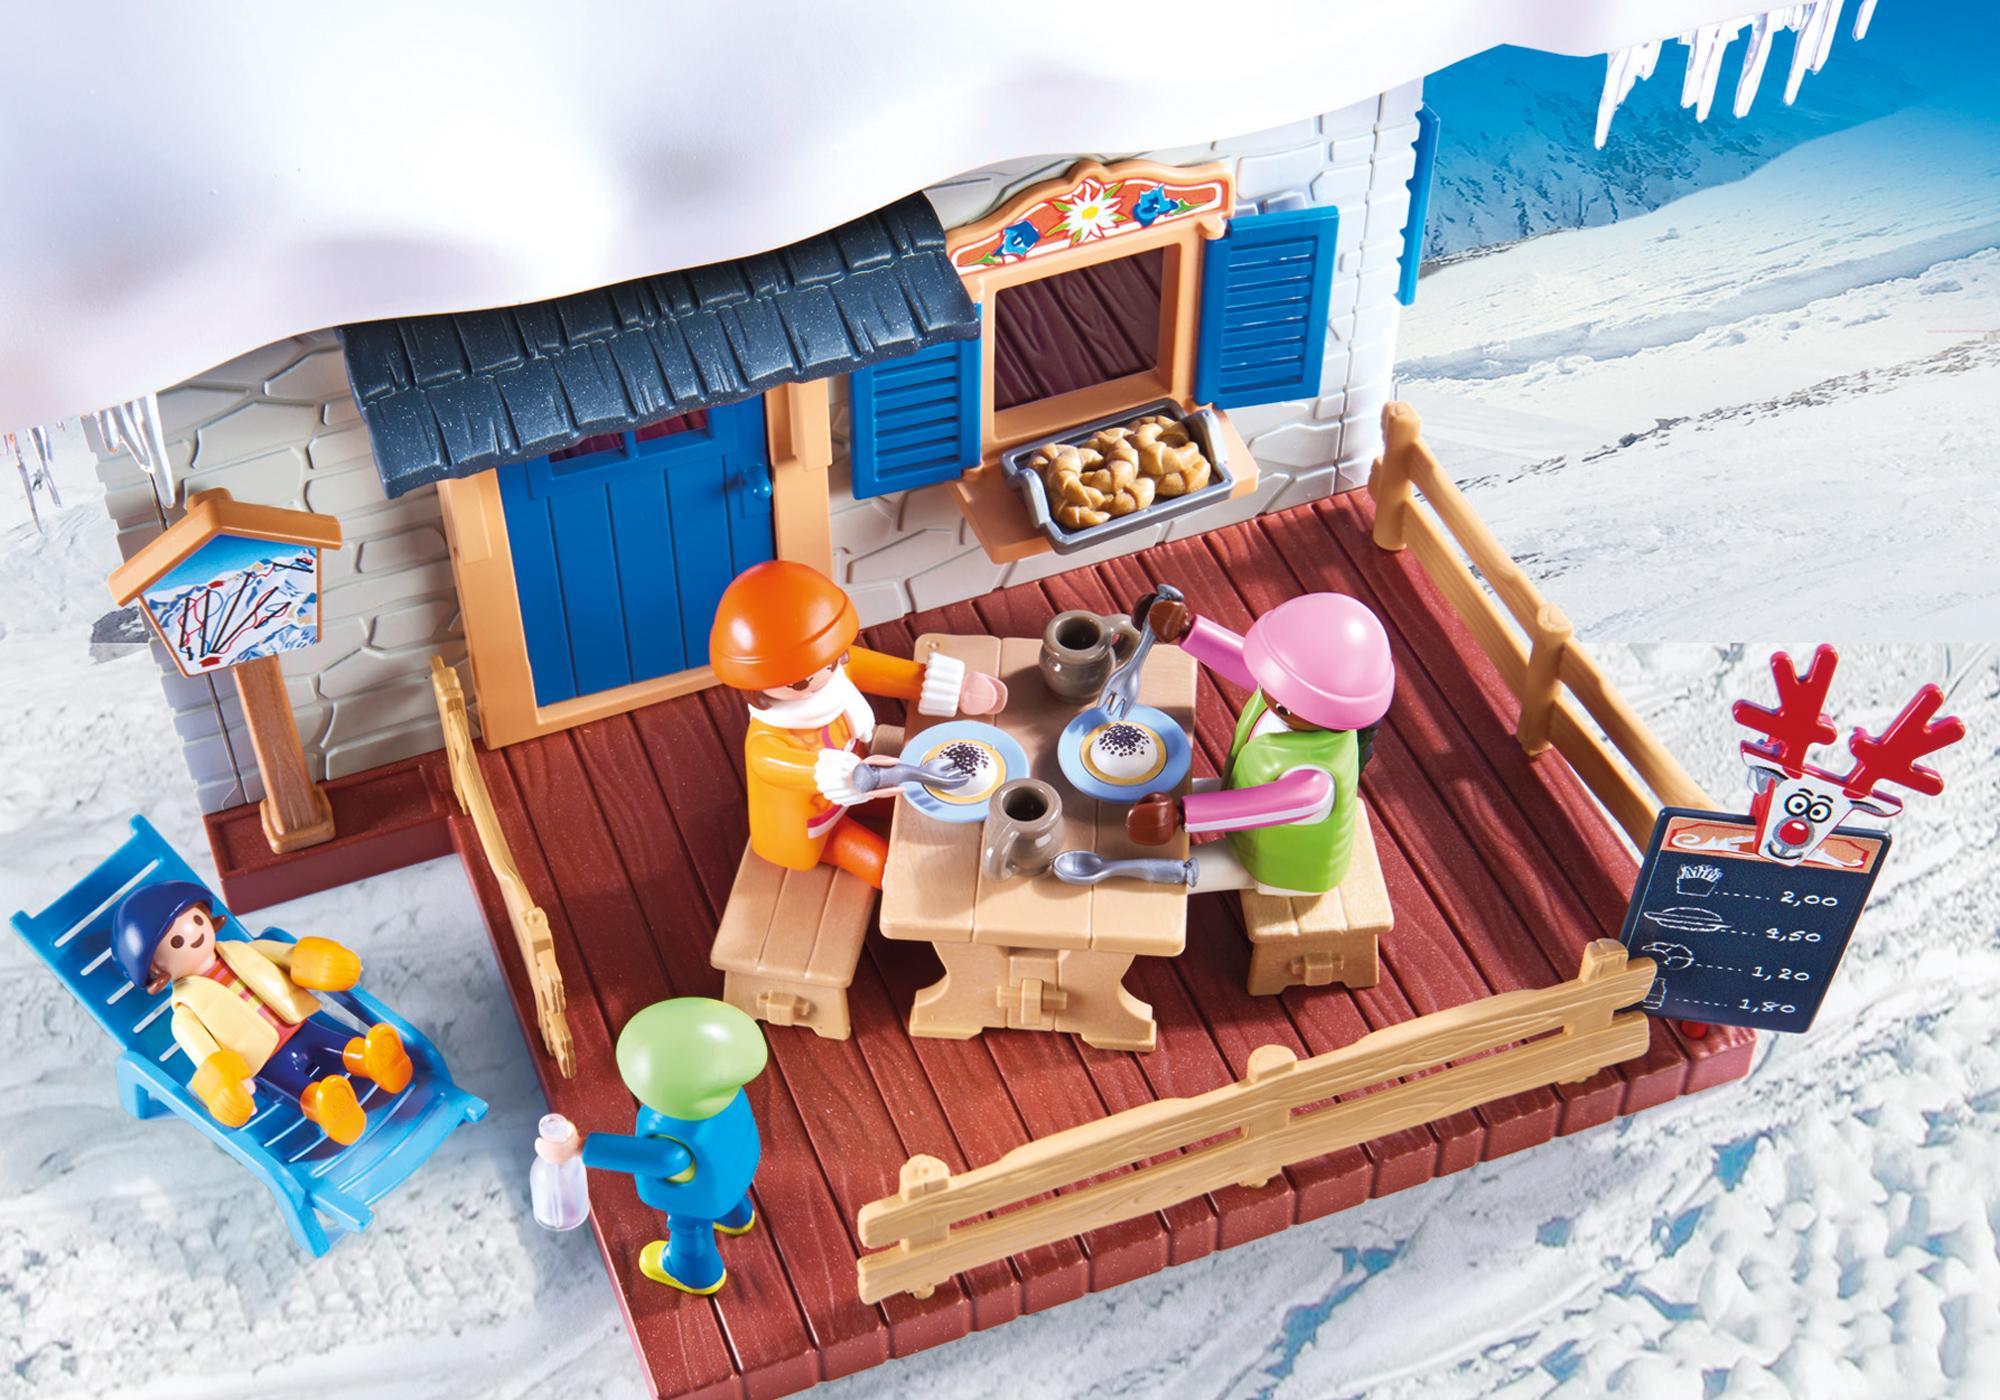 http://media.playmobil.com/i/playmobil/9280_product_extra1/Chalet avec skieurs